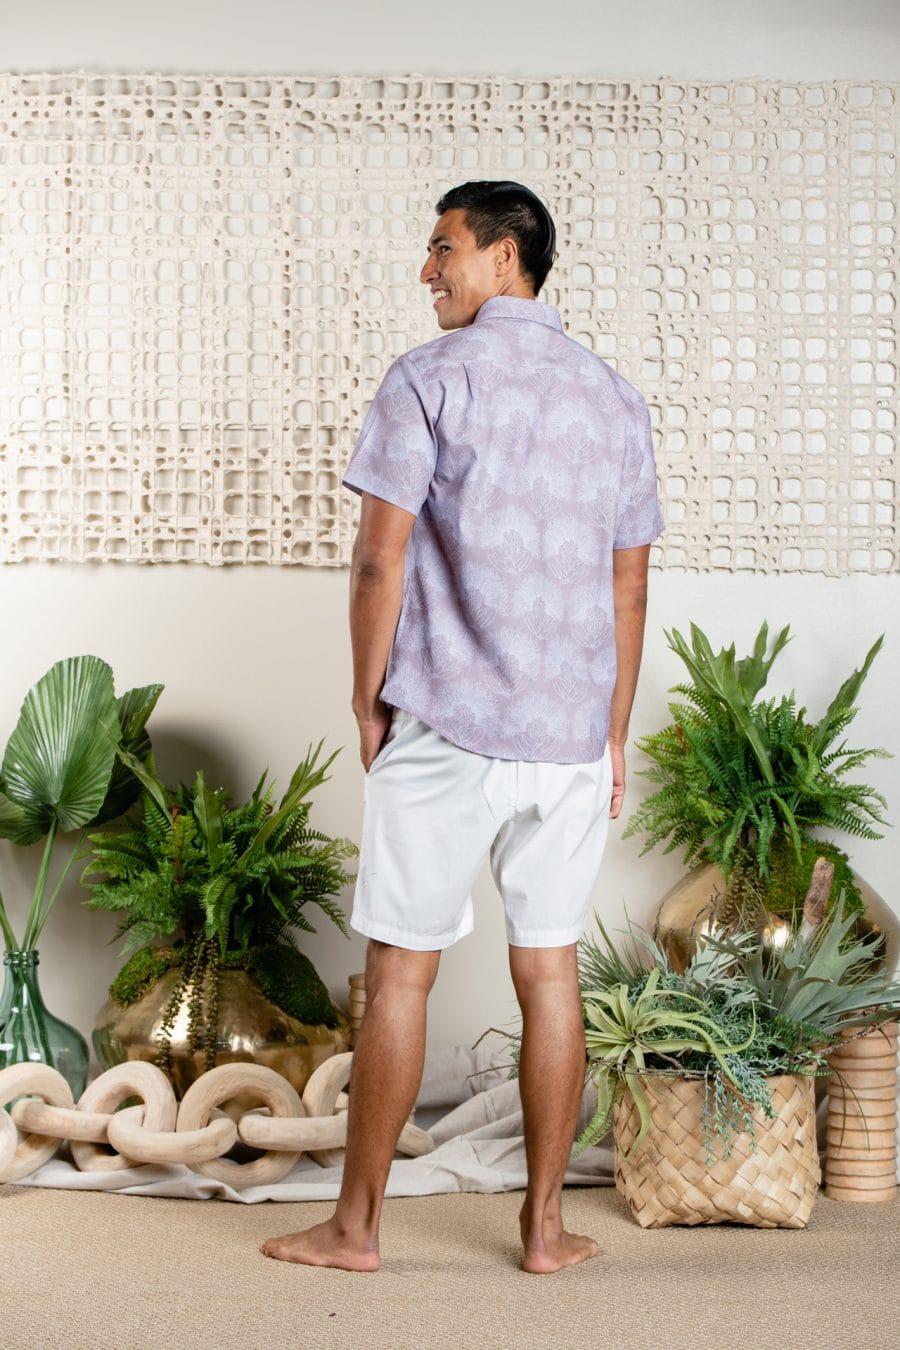 Male model wearing Aloha Short Sleeve in Kalihilehua - Back View